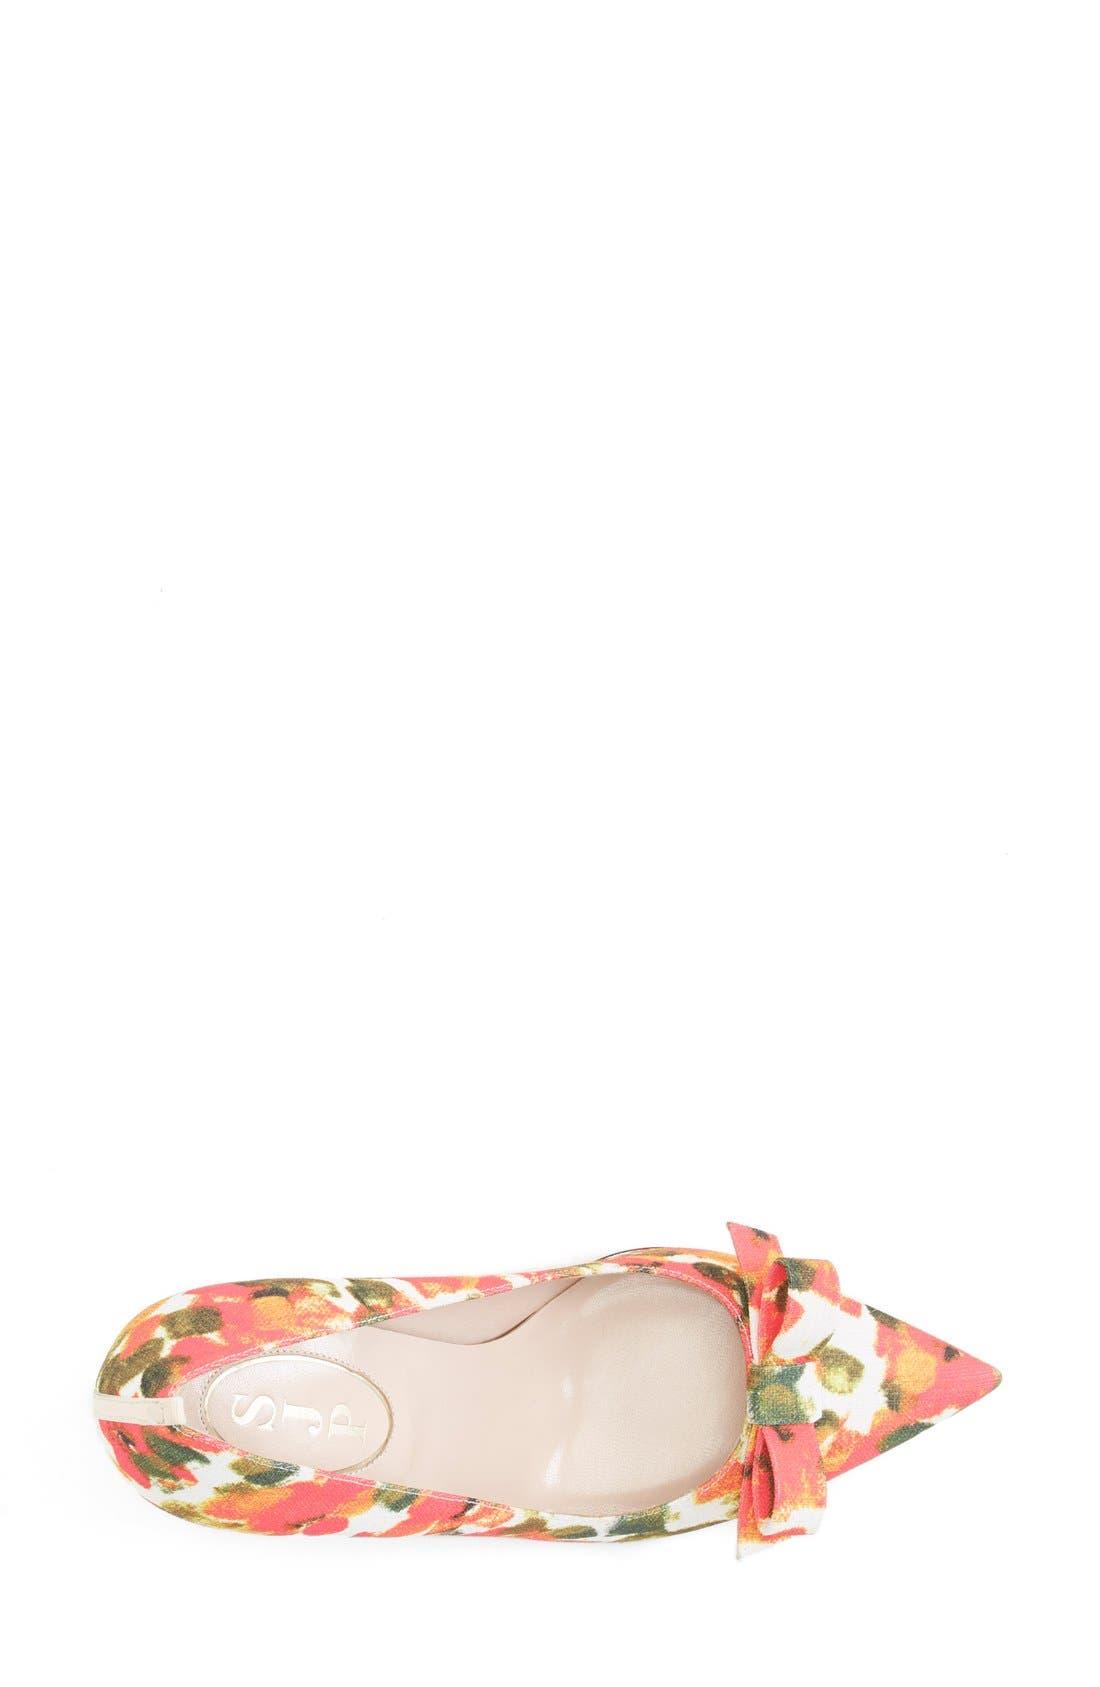 SJP 'Sister' Pointy Toe Pump,                             Alternate thumbnail 3, color,                             Floral Print